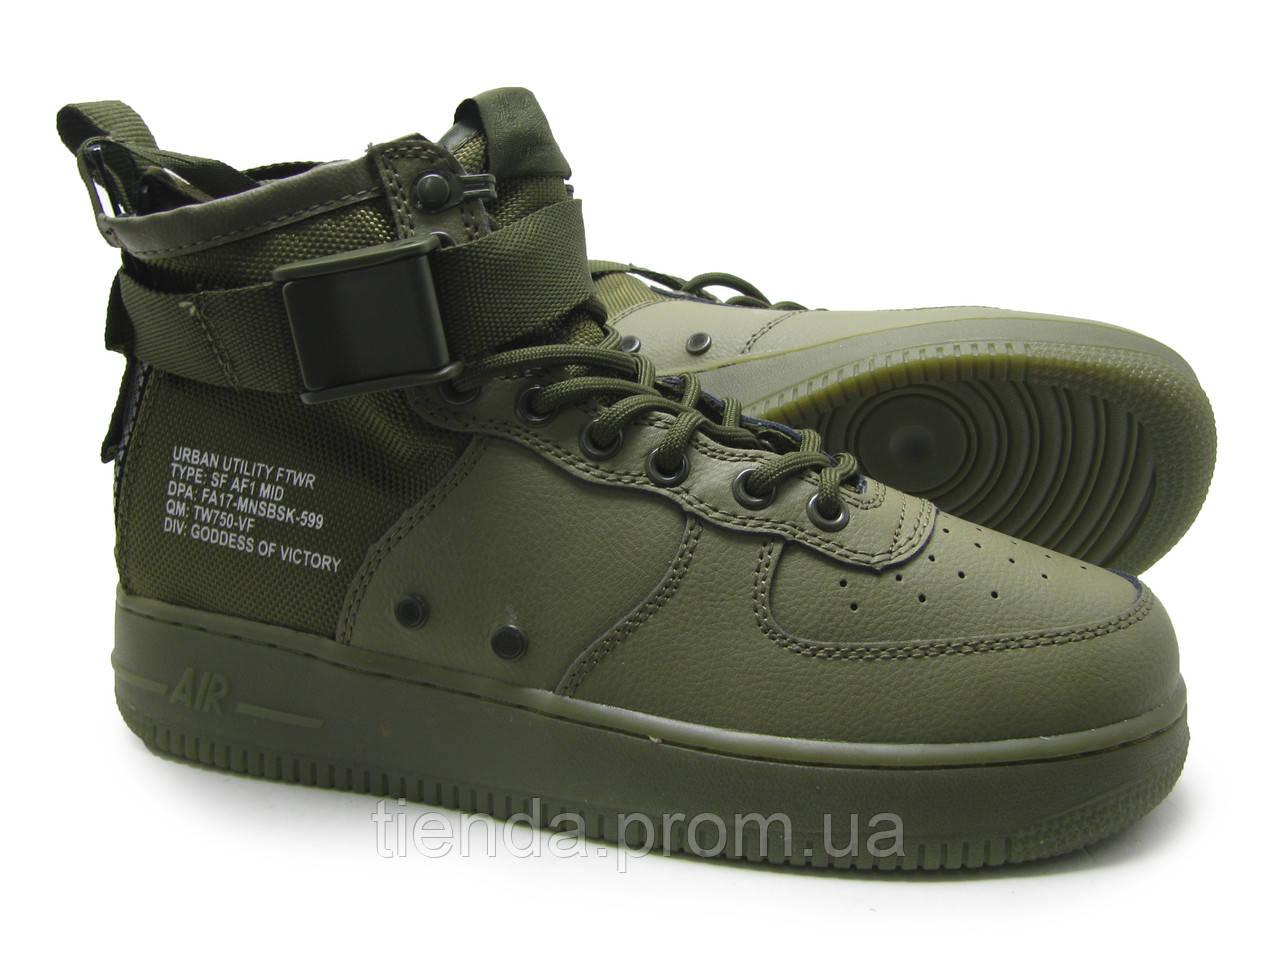 b59e35ed Мужские Кроссовки Nike SF Air Force 1 Utility Mid Haki: продажа ...